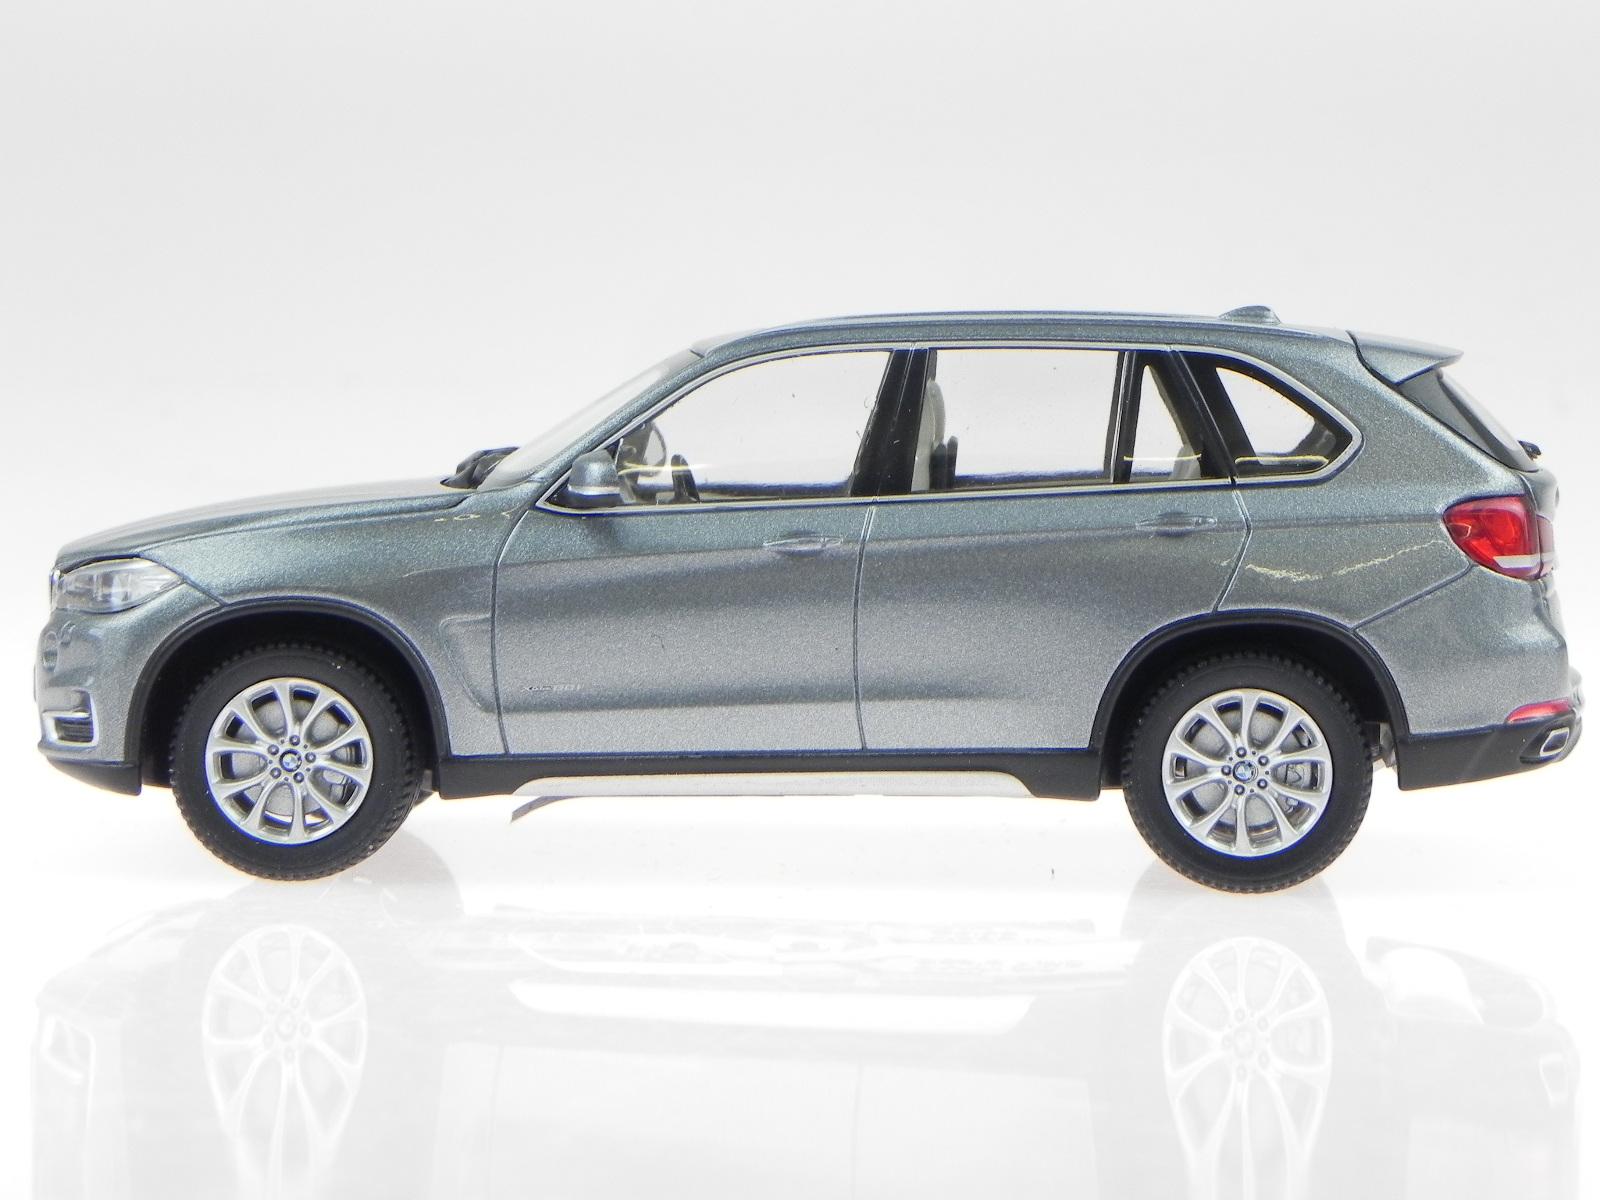 BMW-F15-X5-2015-space-gris-coche-en-miniatura-91041-Paragon-1-43